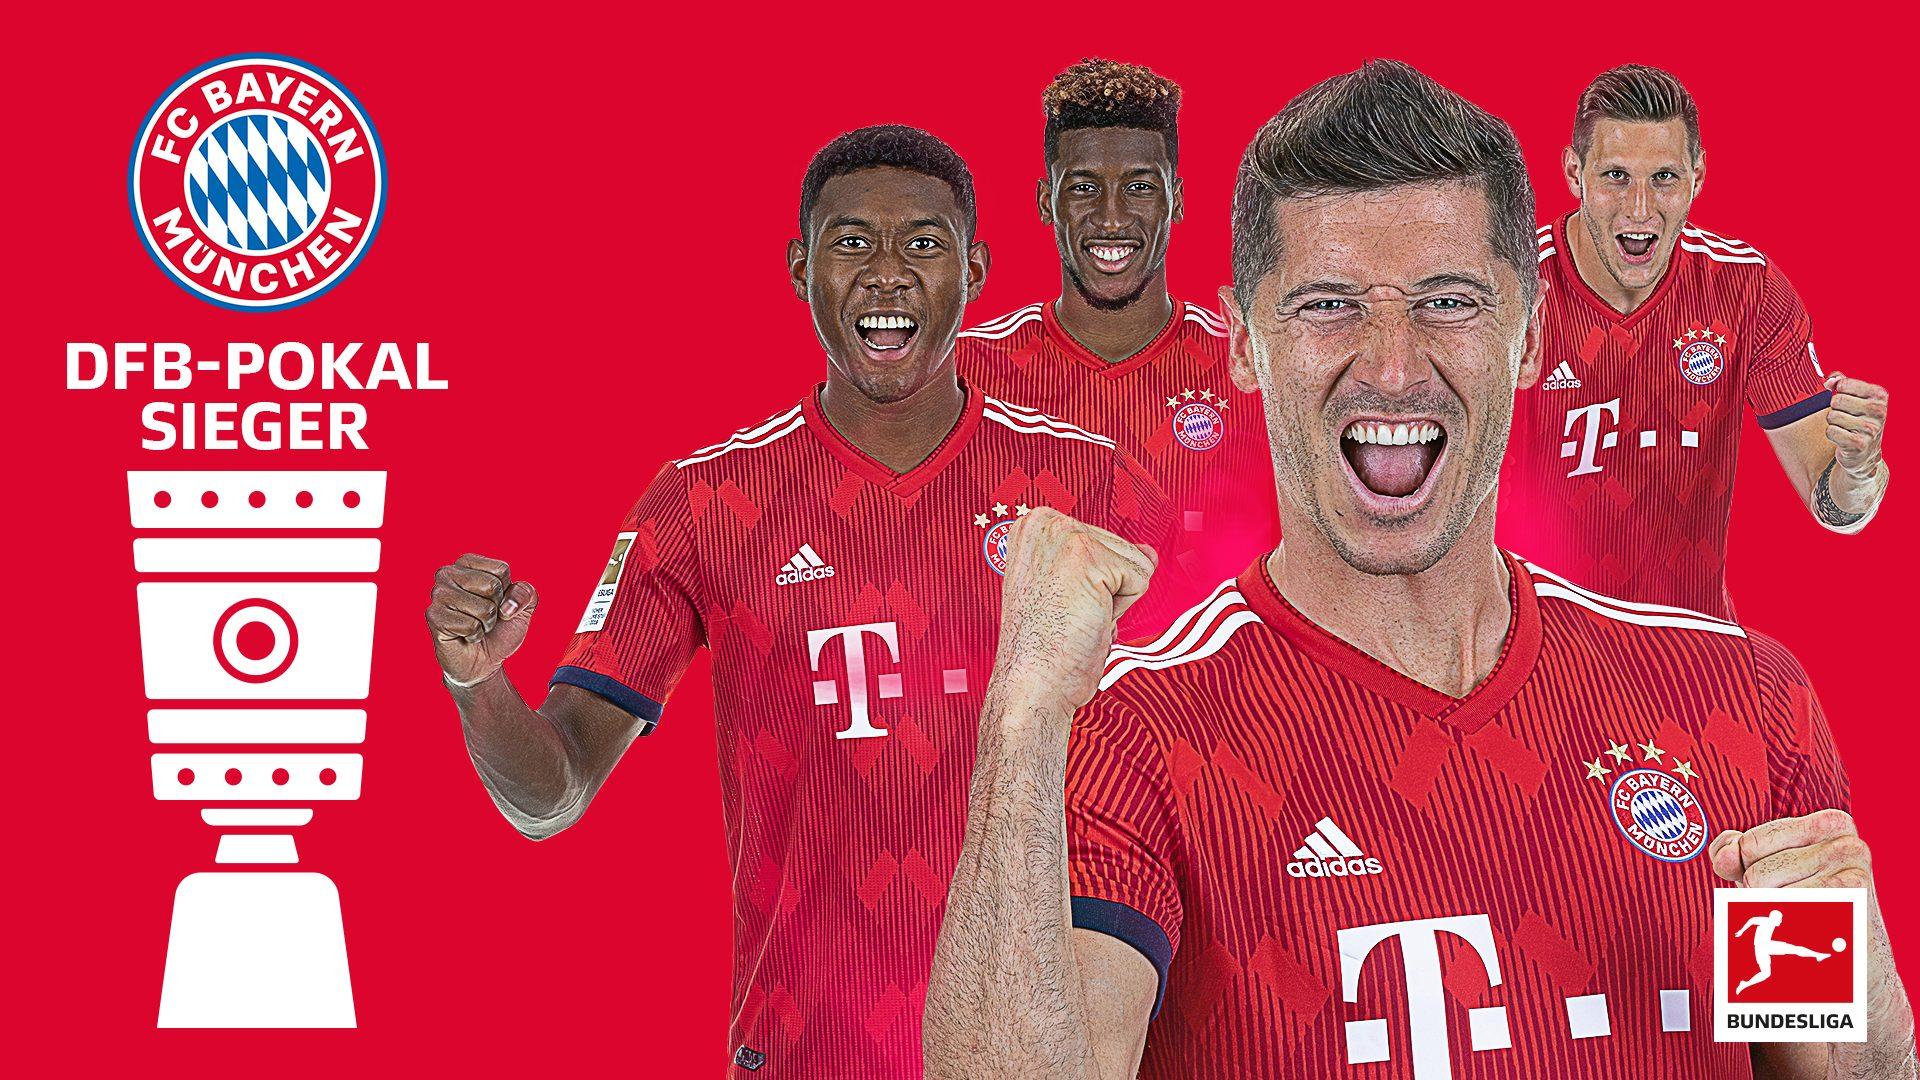 Bundesliga Liveblog Zum Pokalfinale Rb Leipzig Fc Bayern